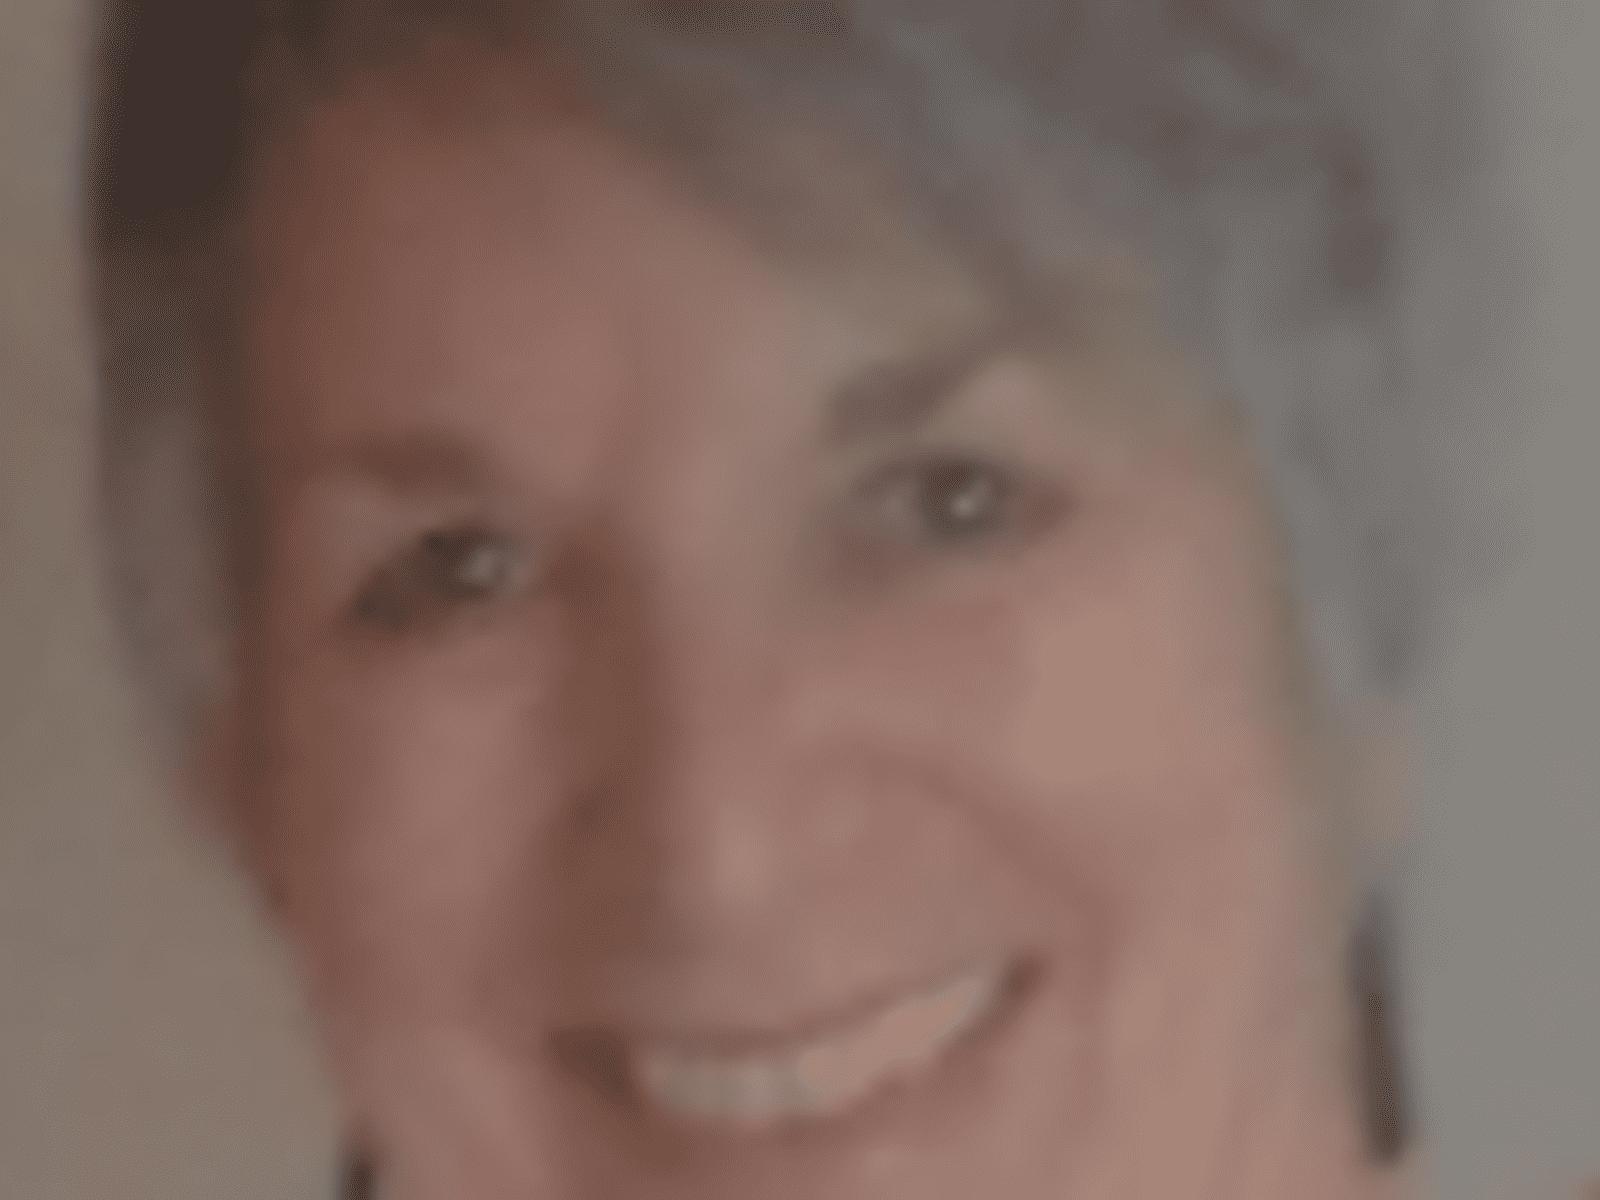 Lesley from Broome, Western Australia, Australia